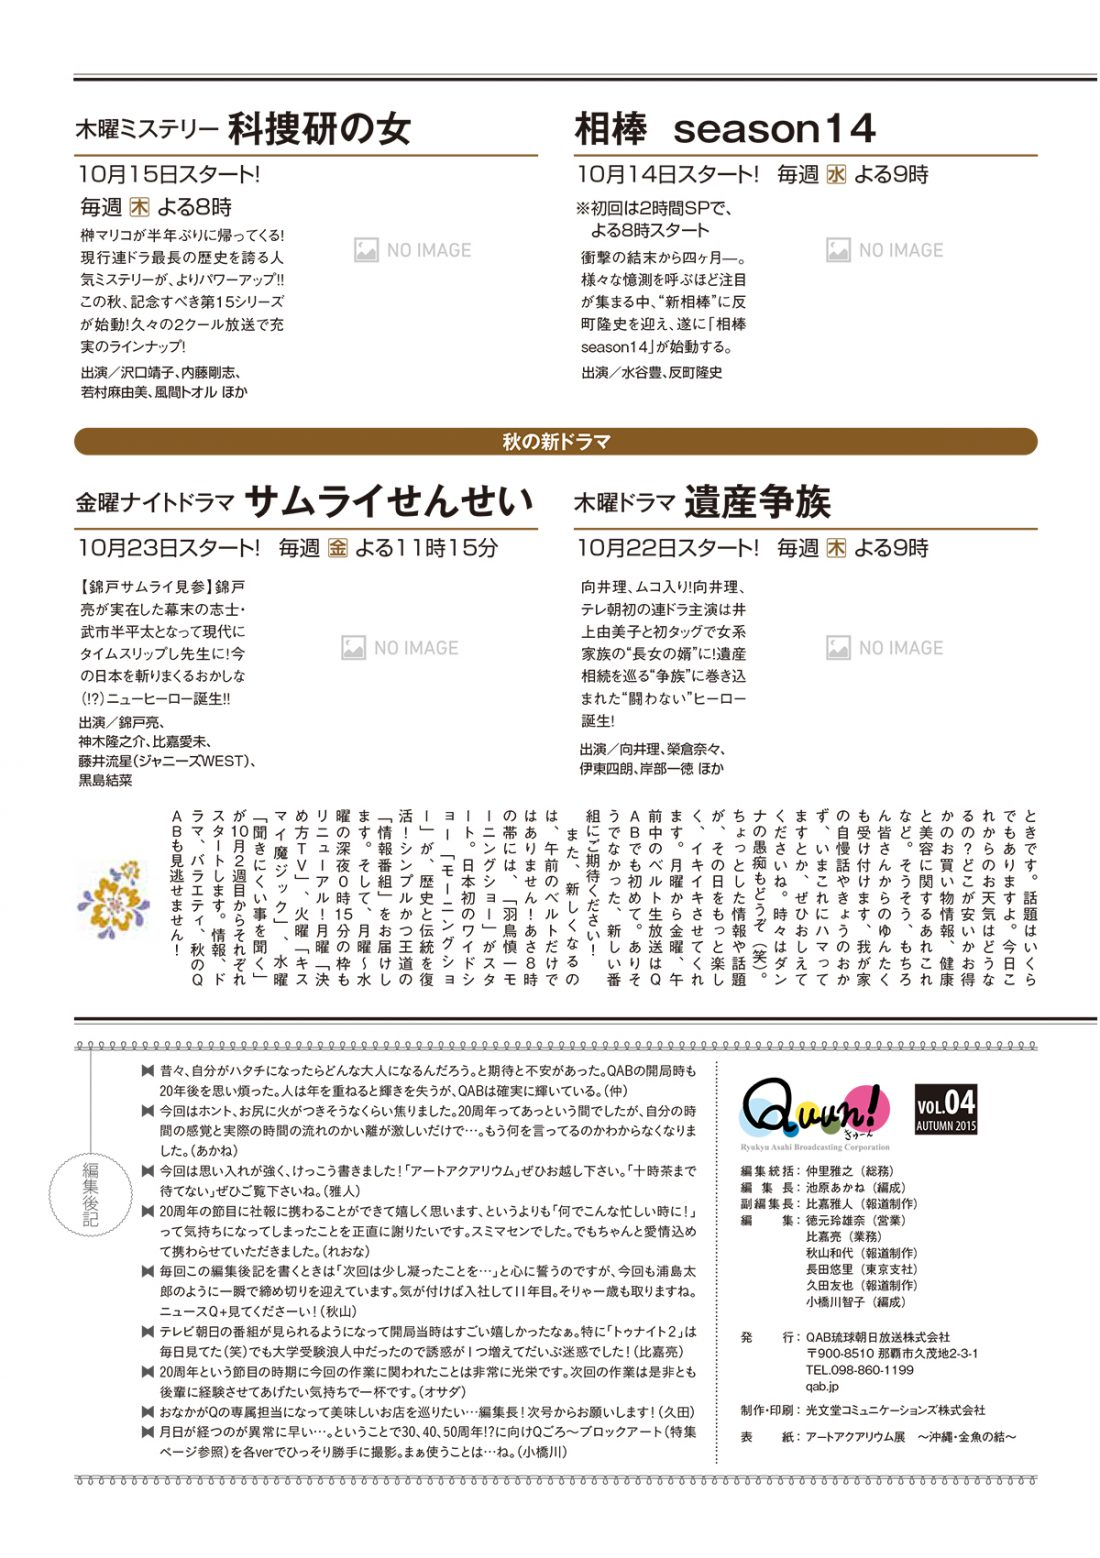 https://www.qab.co.jp/qgoro/wp-content/uploads/quun_0415-1100x1558.jpg